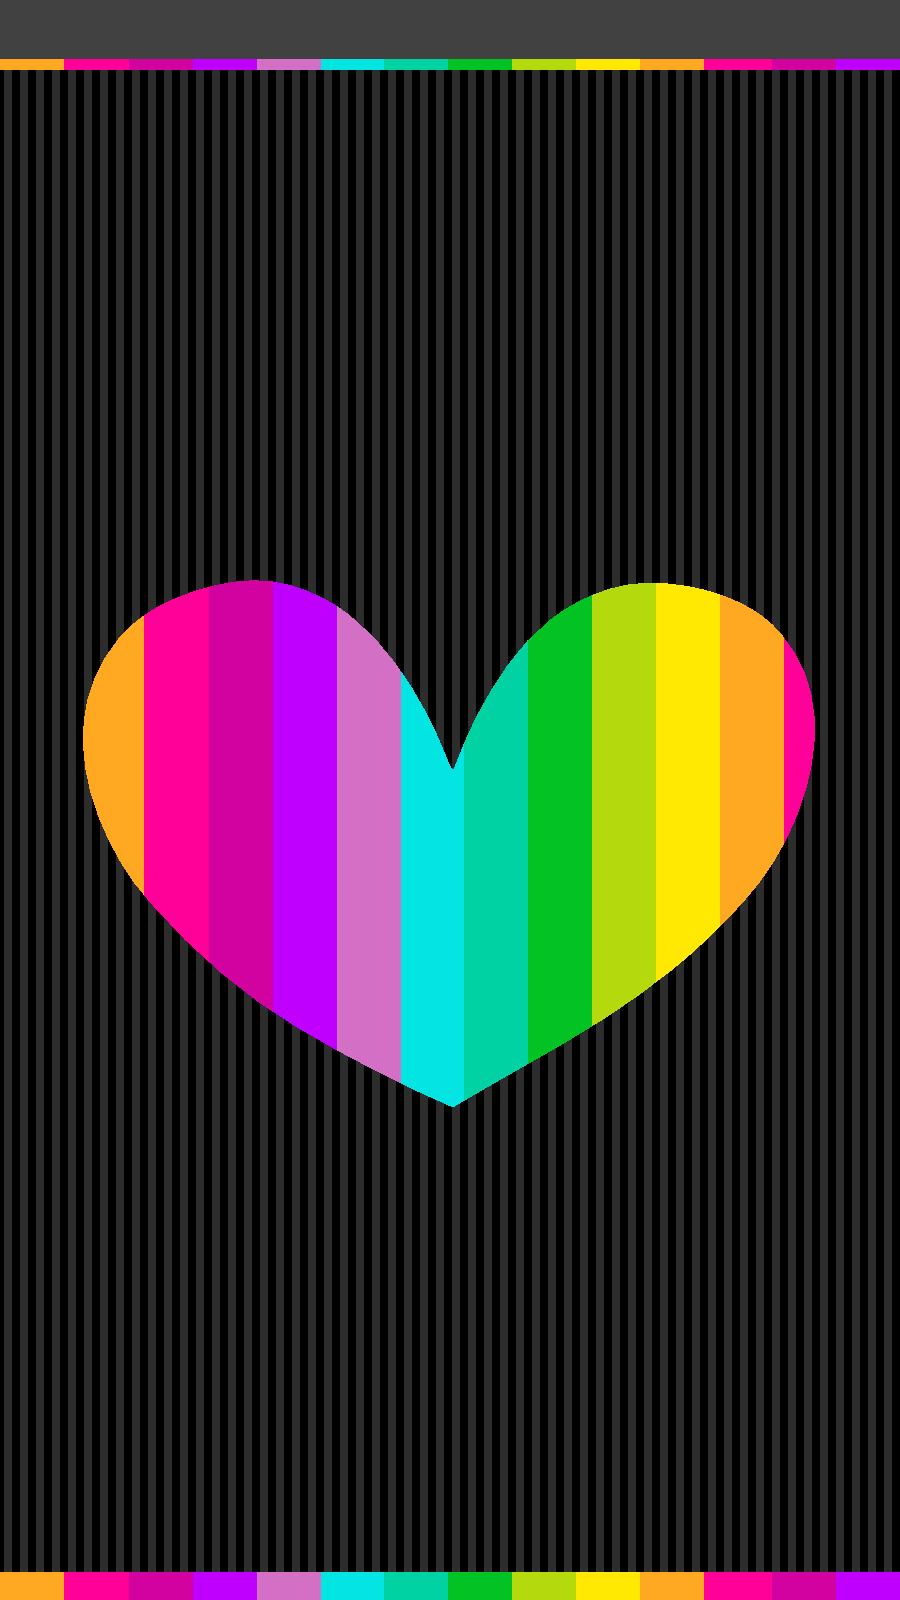 Http Luvnote2 Blogspot Com 2015 07 Rainbow Colors Wallpapers Html M 0 Heart Wallpaper Colorful Wallpaper Rainbow Wallpaper